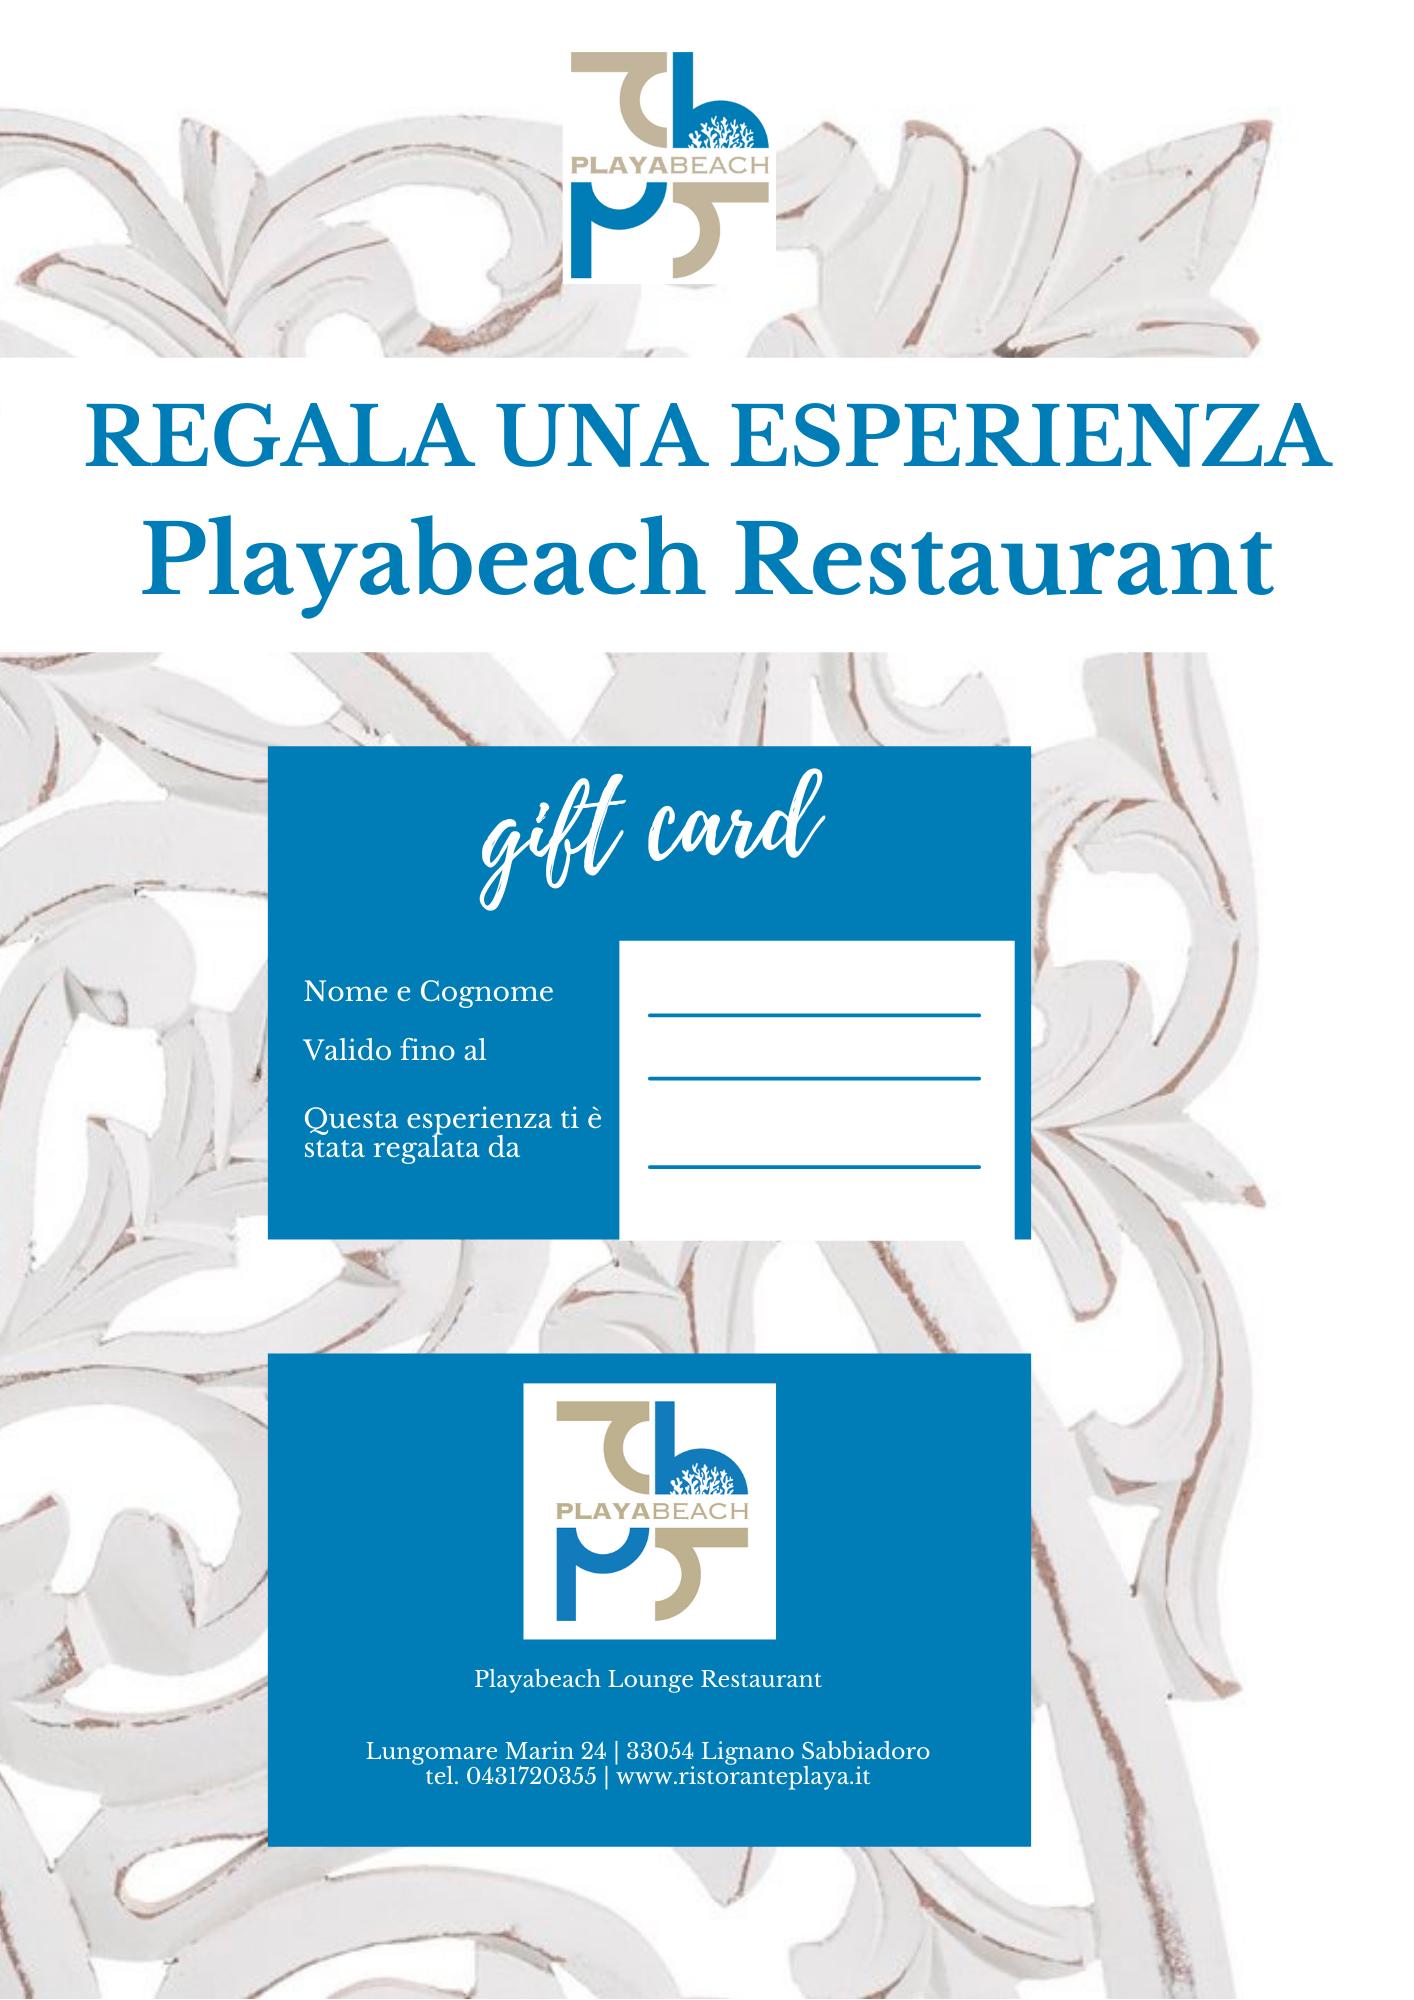 Regala una esperienza Playabeach